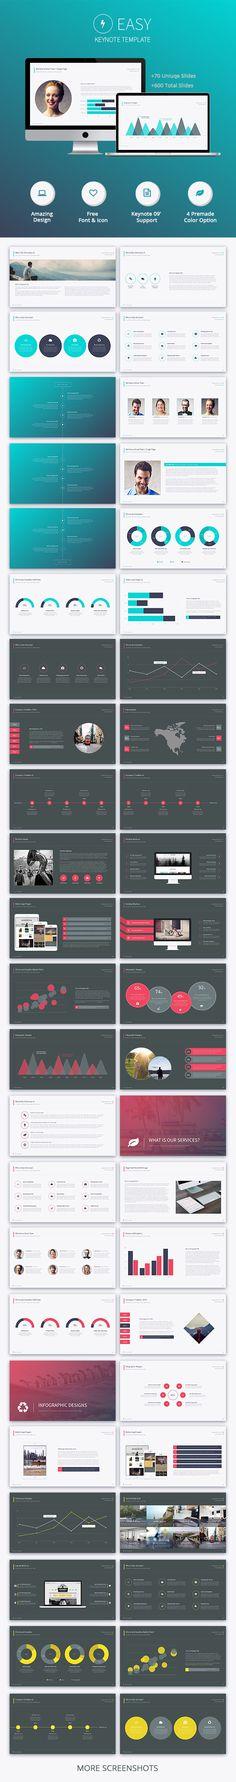 Easy Keynote Template #design Download: http://graphicriver.net/item/easy-keynote-template/11811289?ref=ksioks